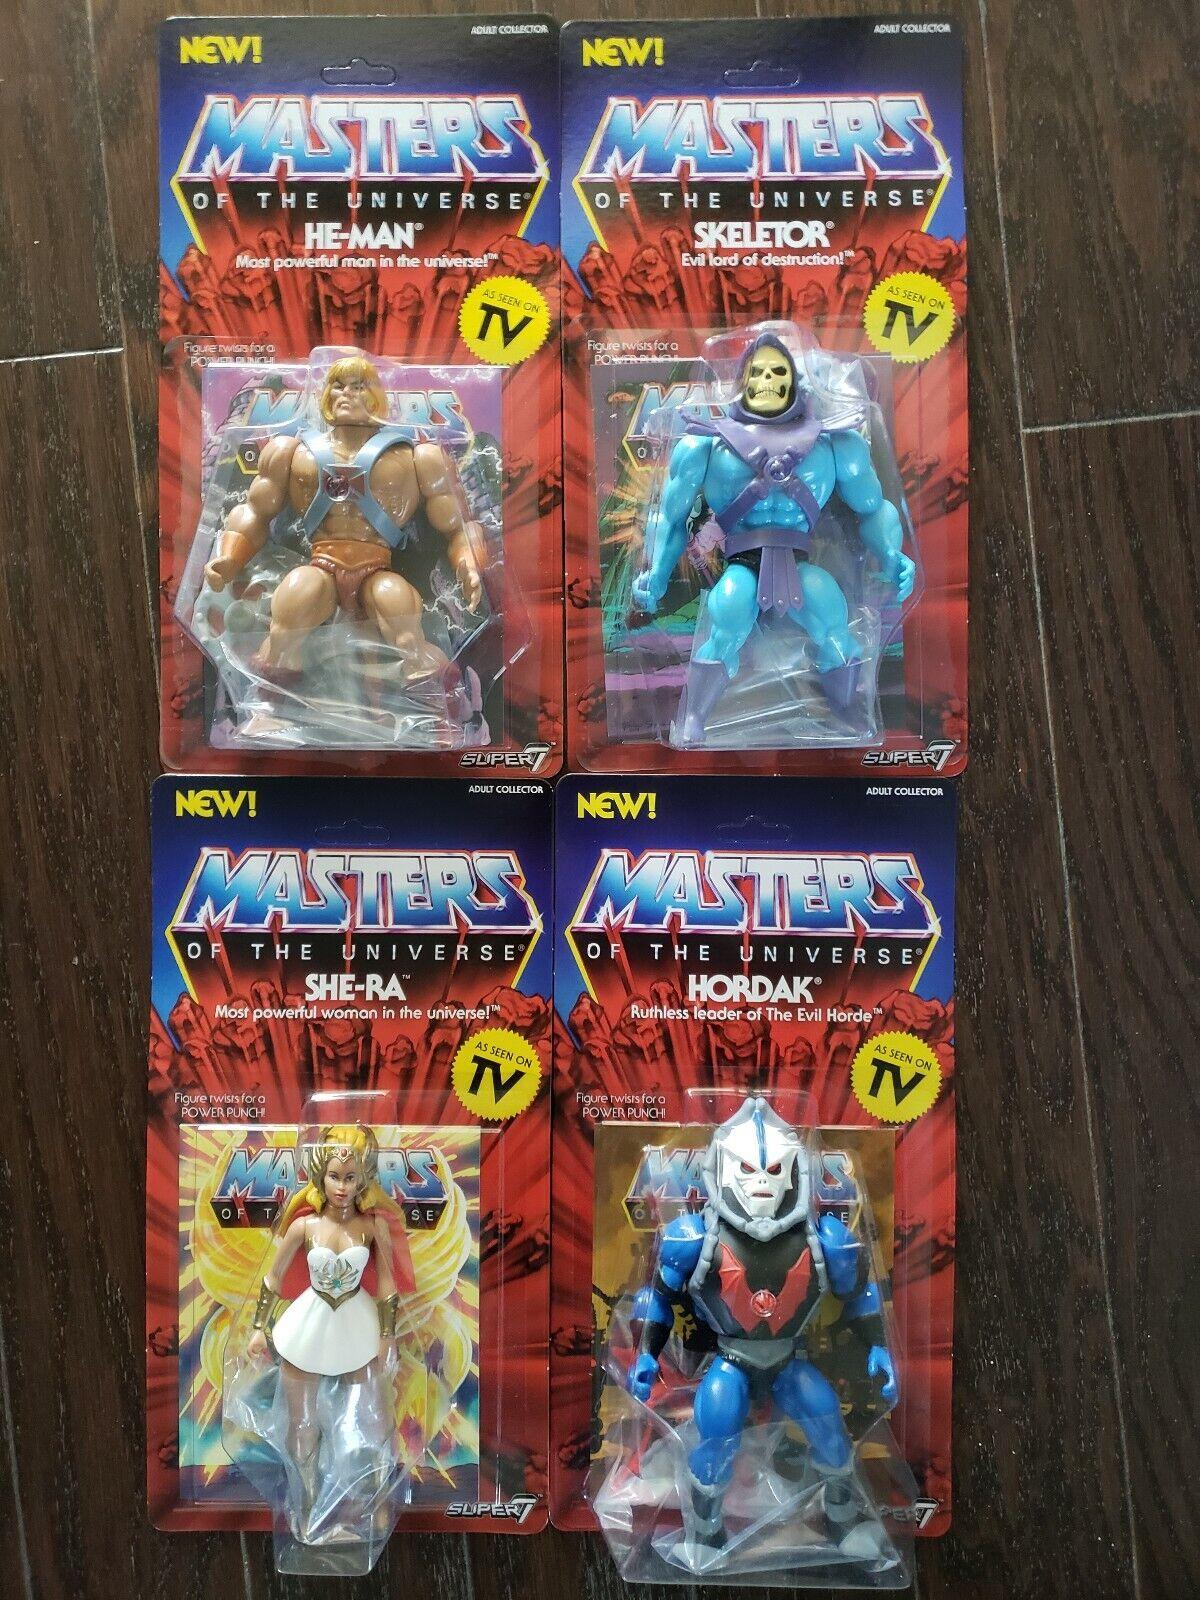 Super7 Masters of the Universe MOTU Wave 1 Set  HEuomo, SKELETOR, HORDAK, SHERA